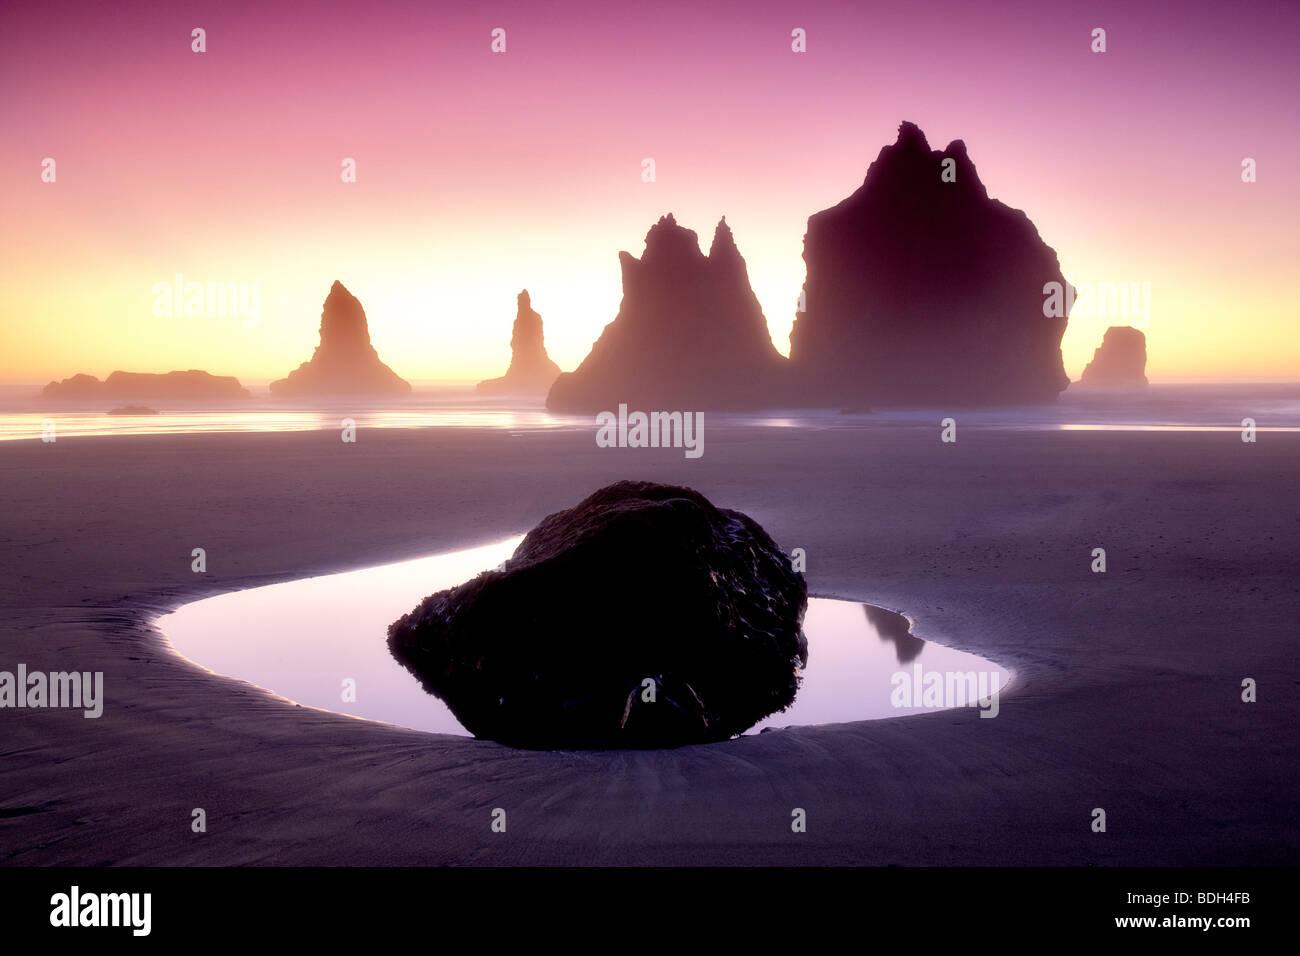 Monolith sea stacks reflecting pool and sunset. Samuel H. Boardman State Scenic Corridor. Oregon - Stock Image